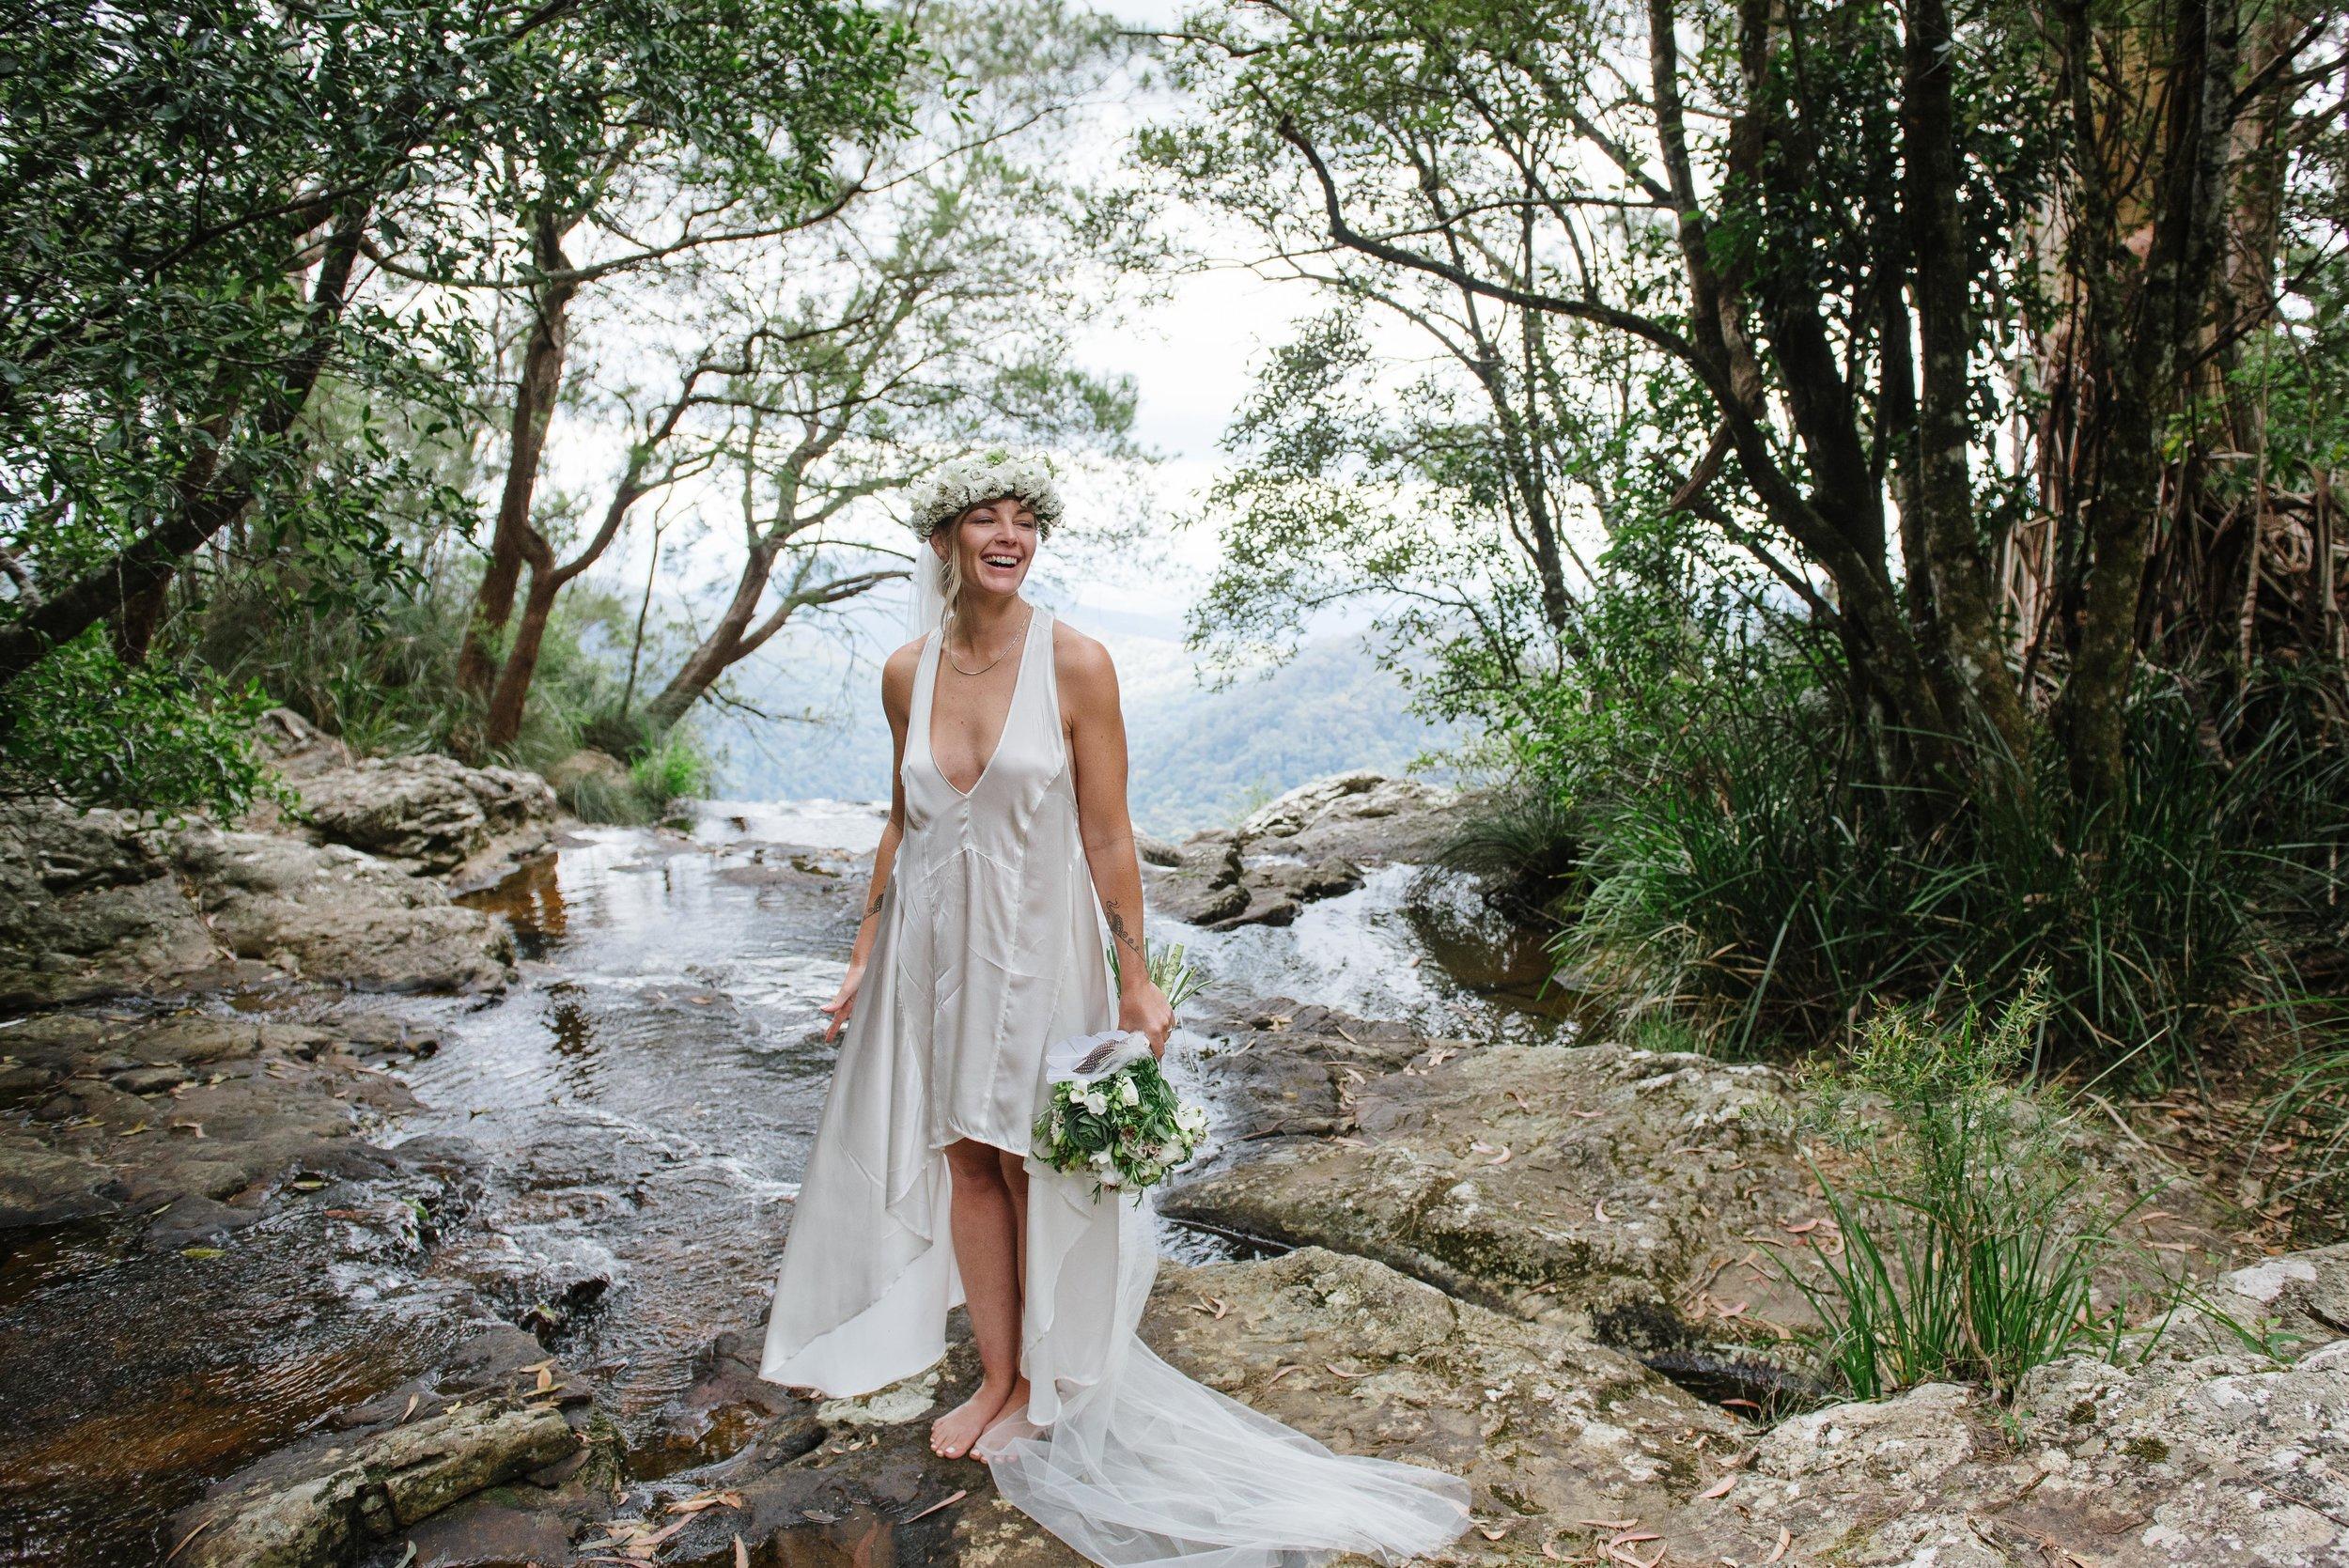 Carla and Luke- wedding photographer, byron bay wedding and family photographer, tweed heads wedding and family photography-293.jpg